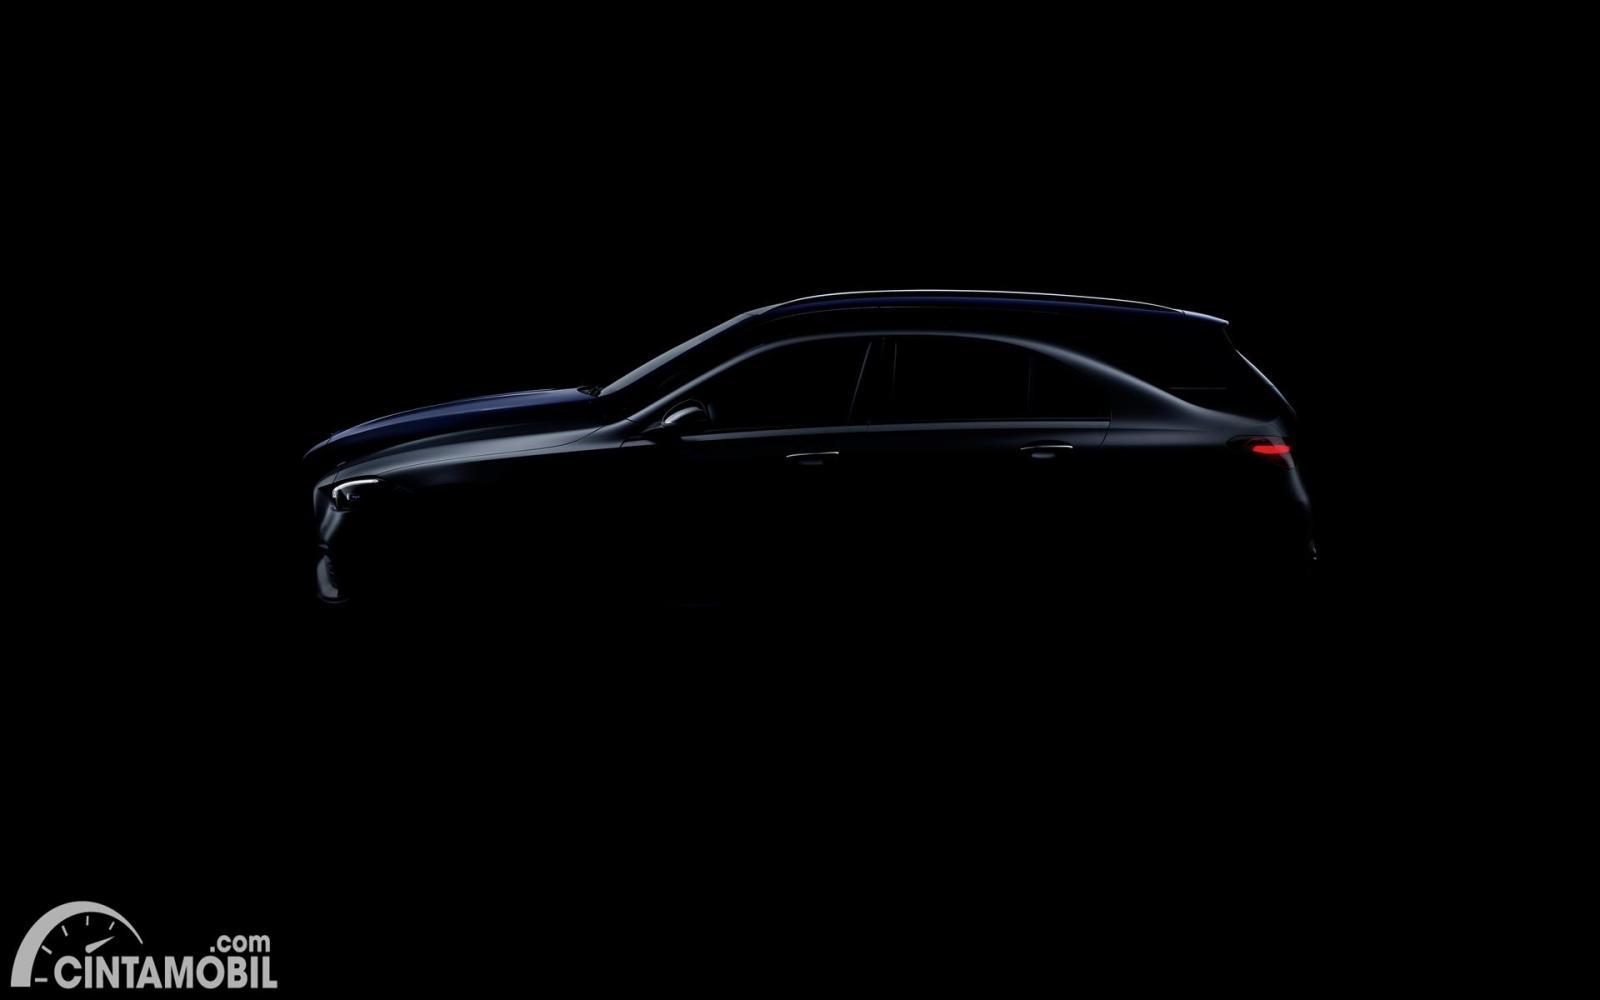 siluet Mercedes-Benz C-Class Wagon yang lebih tinggi